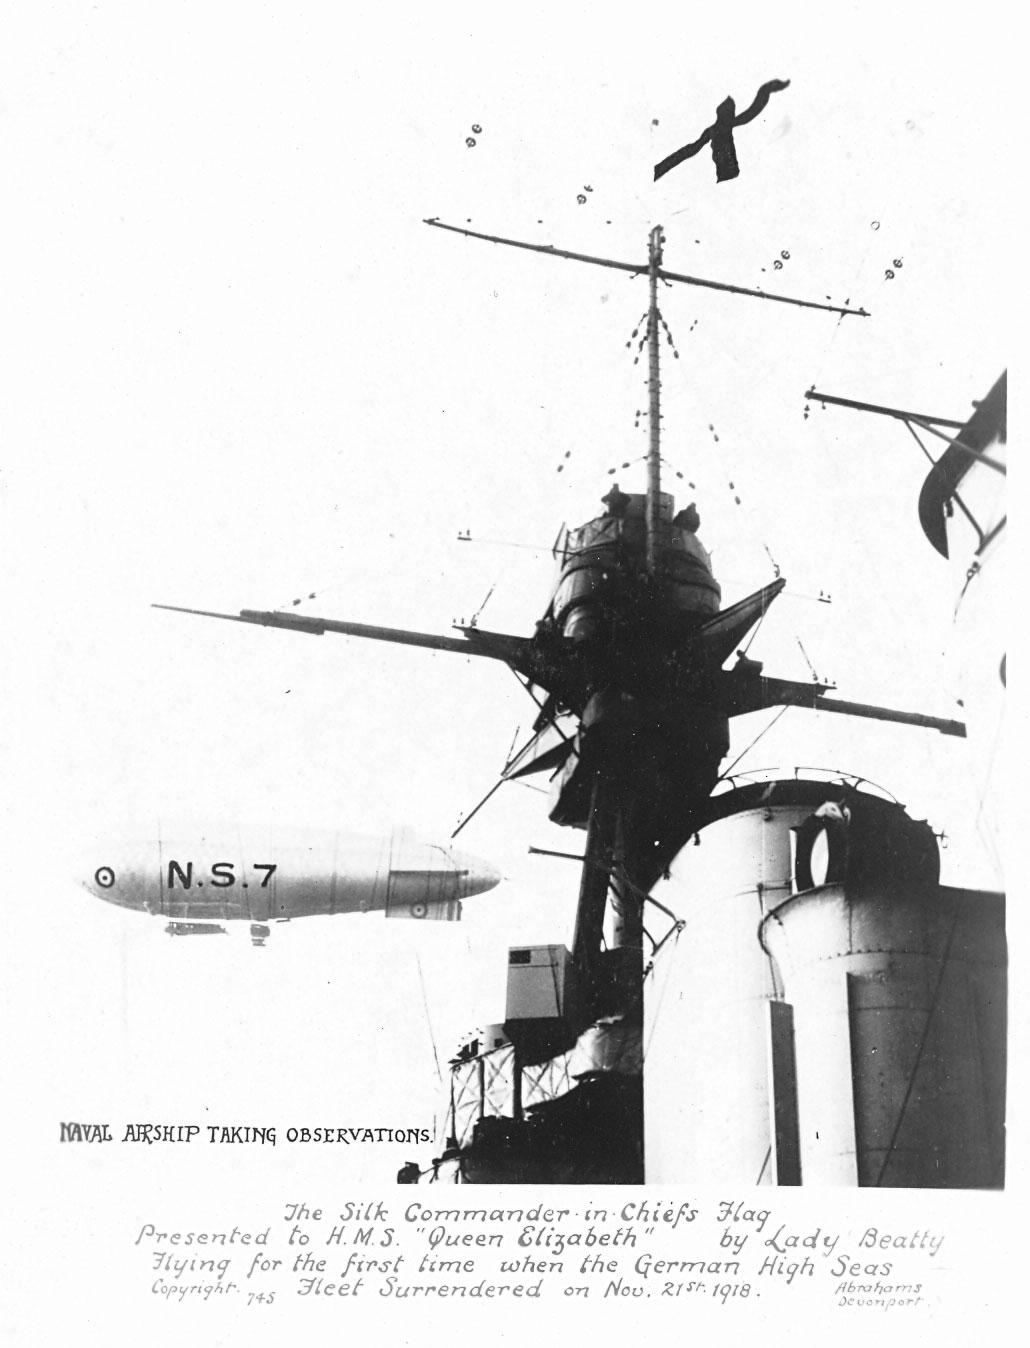 NS7 on patrol above HMS Princess Elizabeth